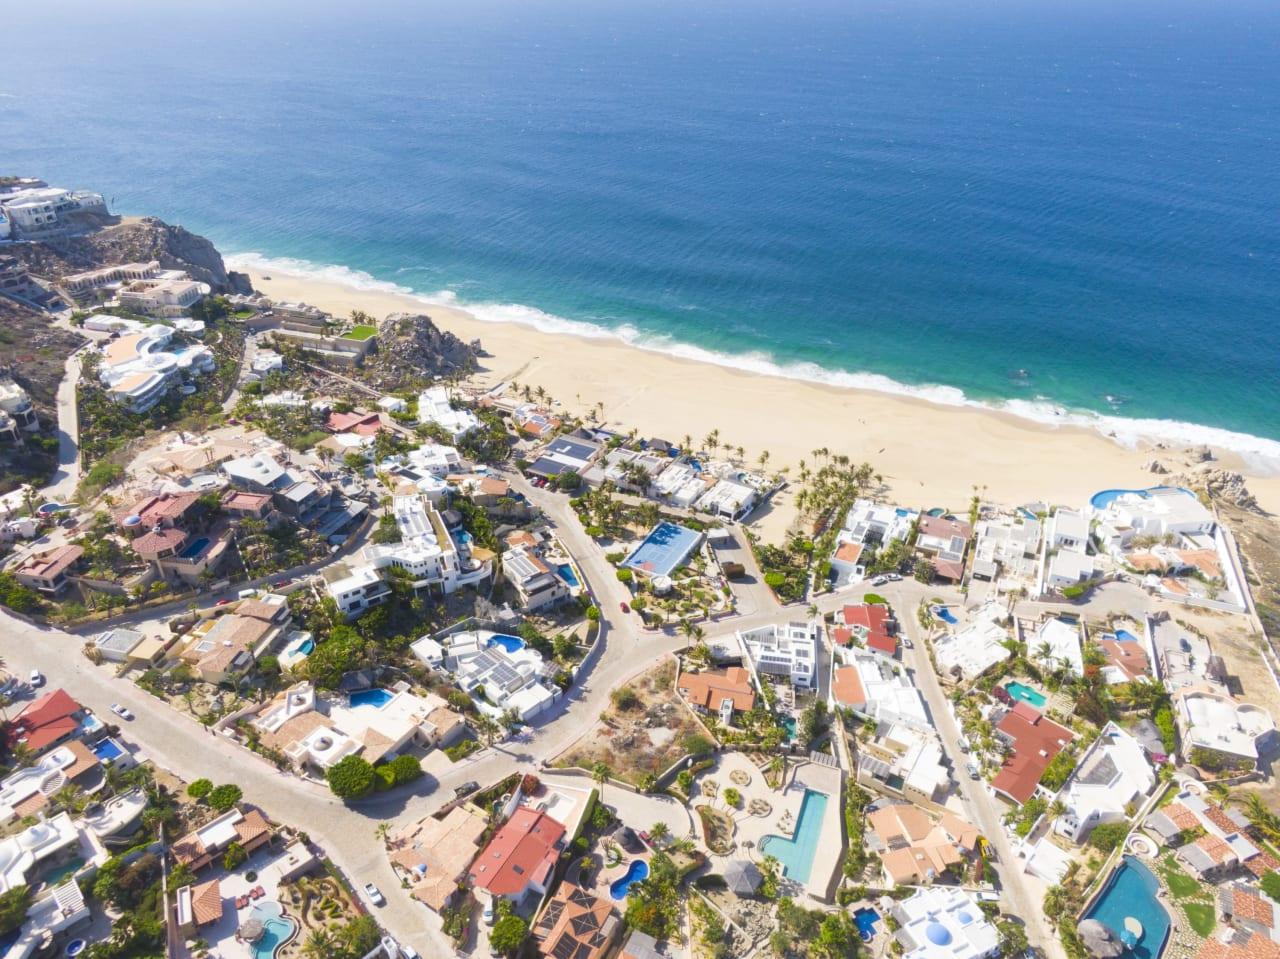 ABC of Real Estate in Baja California Sur